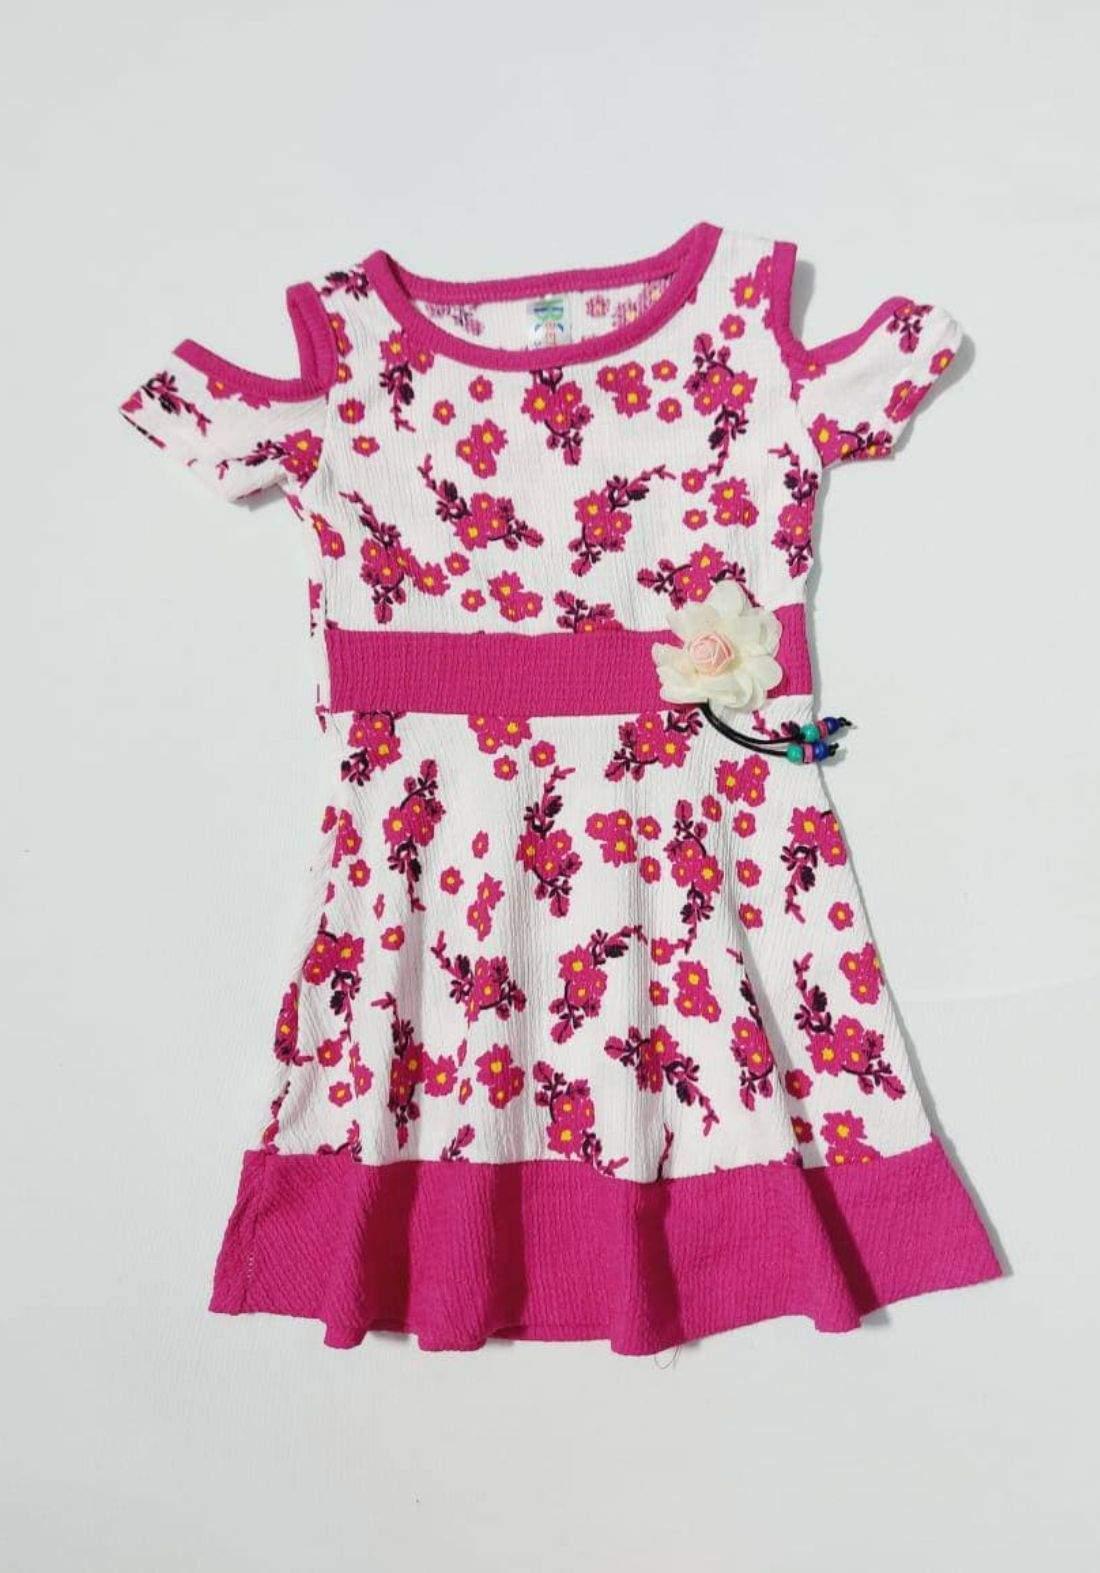 Dress for girls pink  فستان بناتي وردي